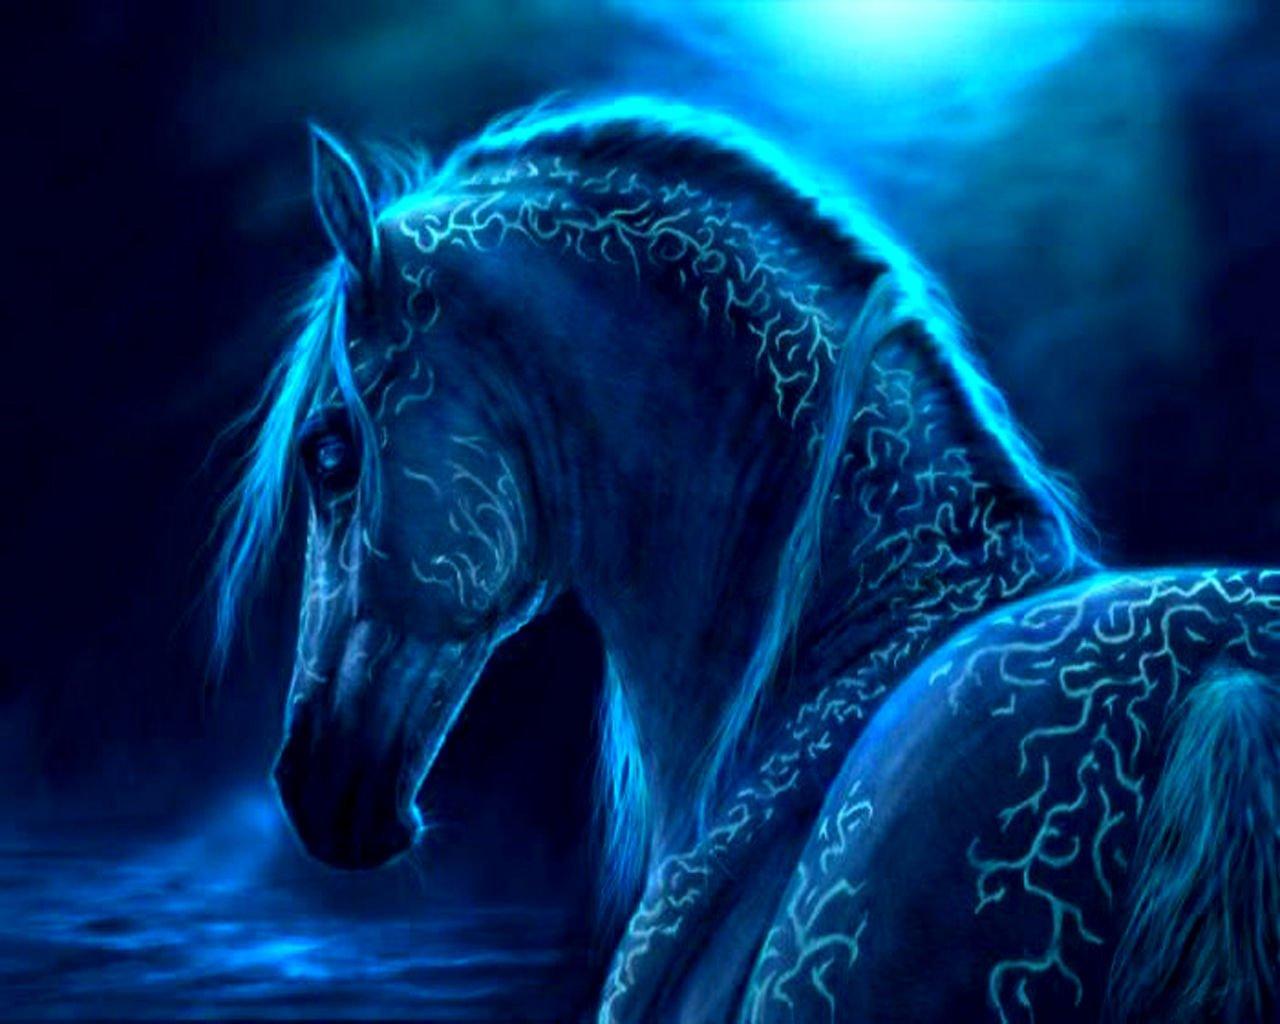 Horse Blue Magical Wallpaper 1280x1024 Full HD Wallpapers 1280x1024